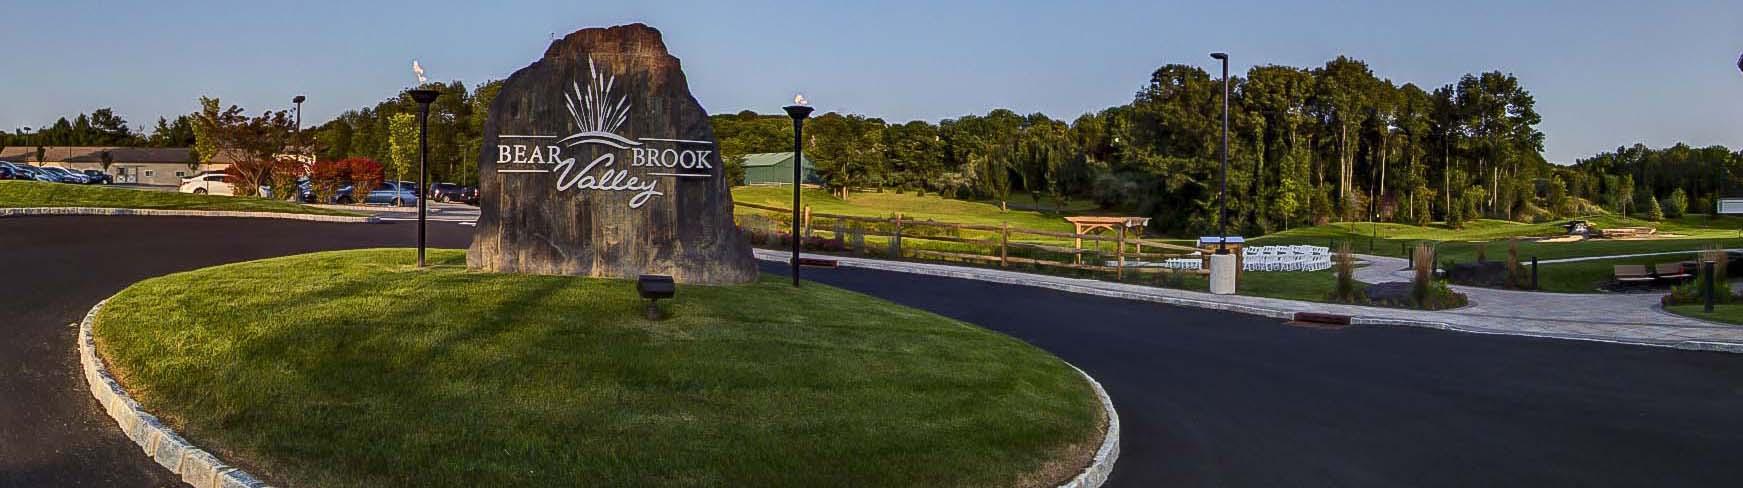 Bear Brook Valley, Fredon Township, nj header image